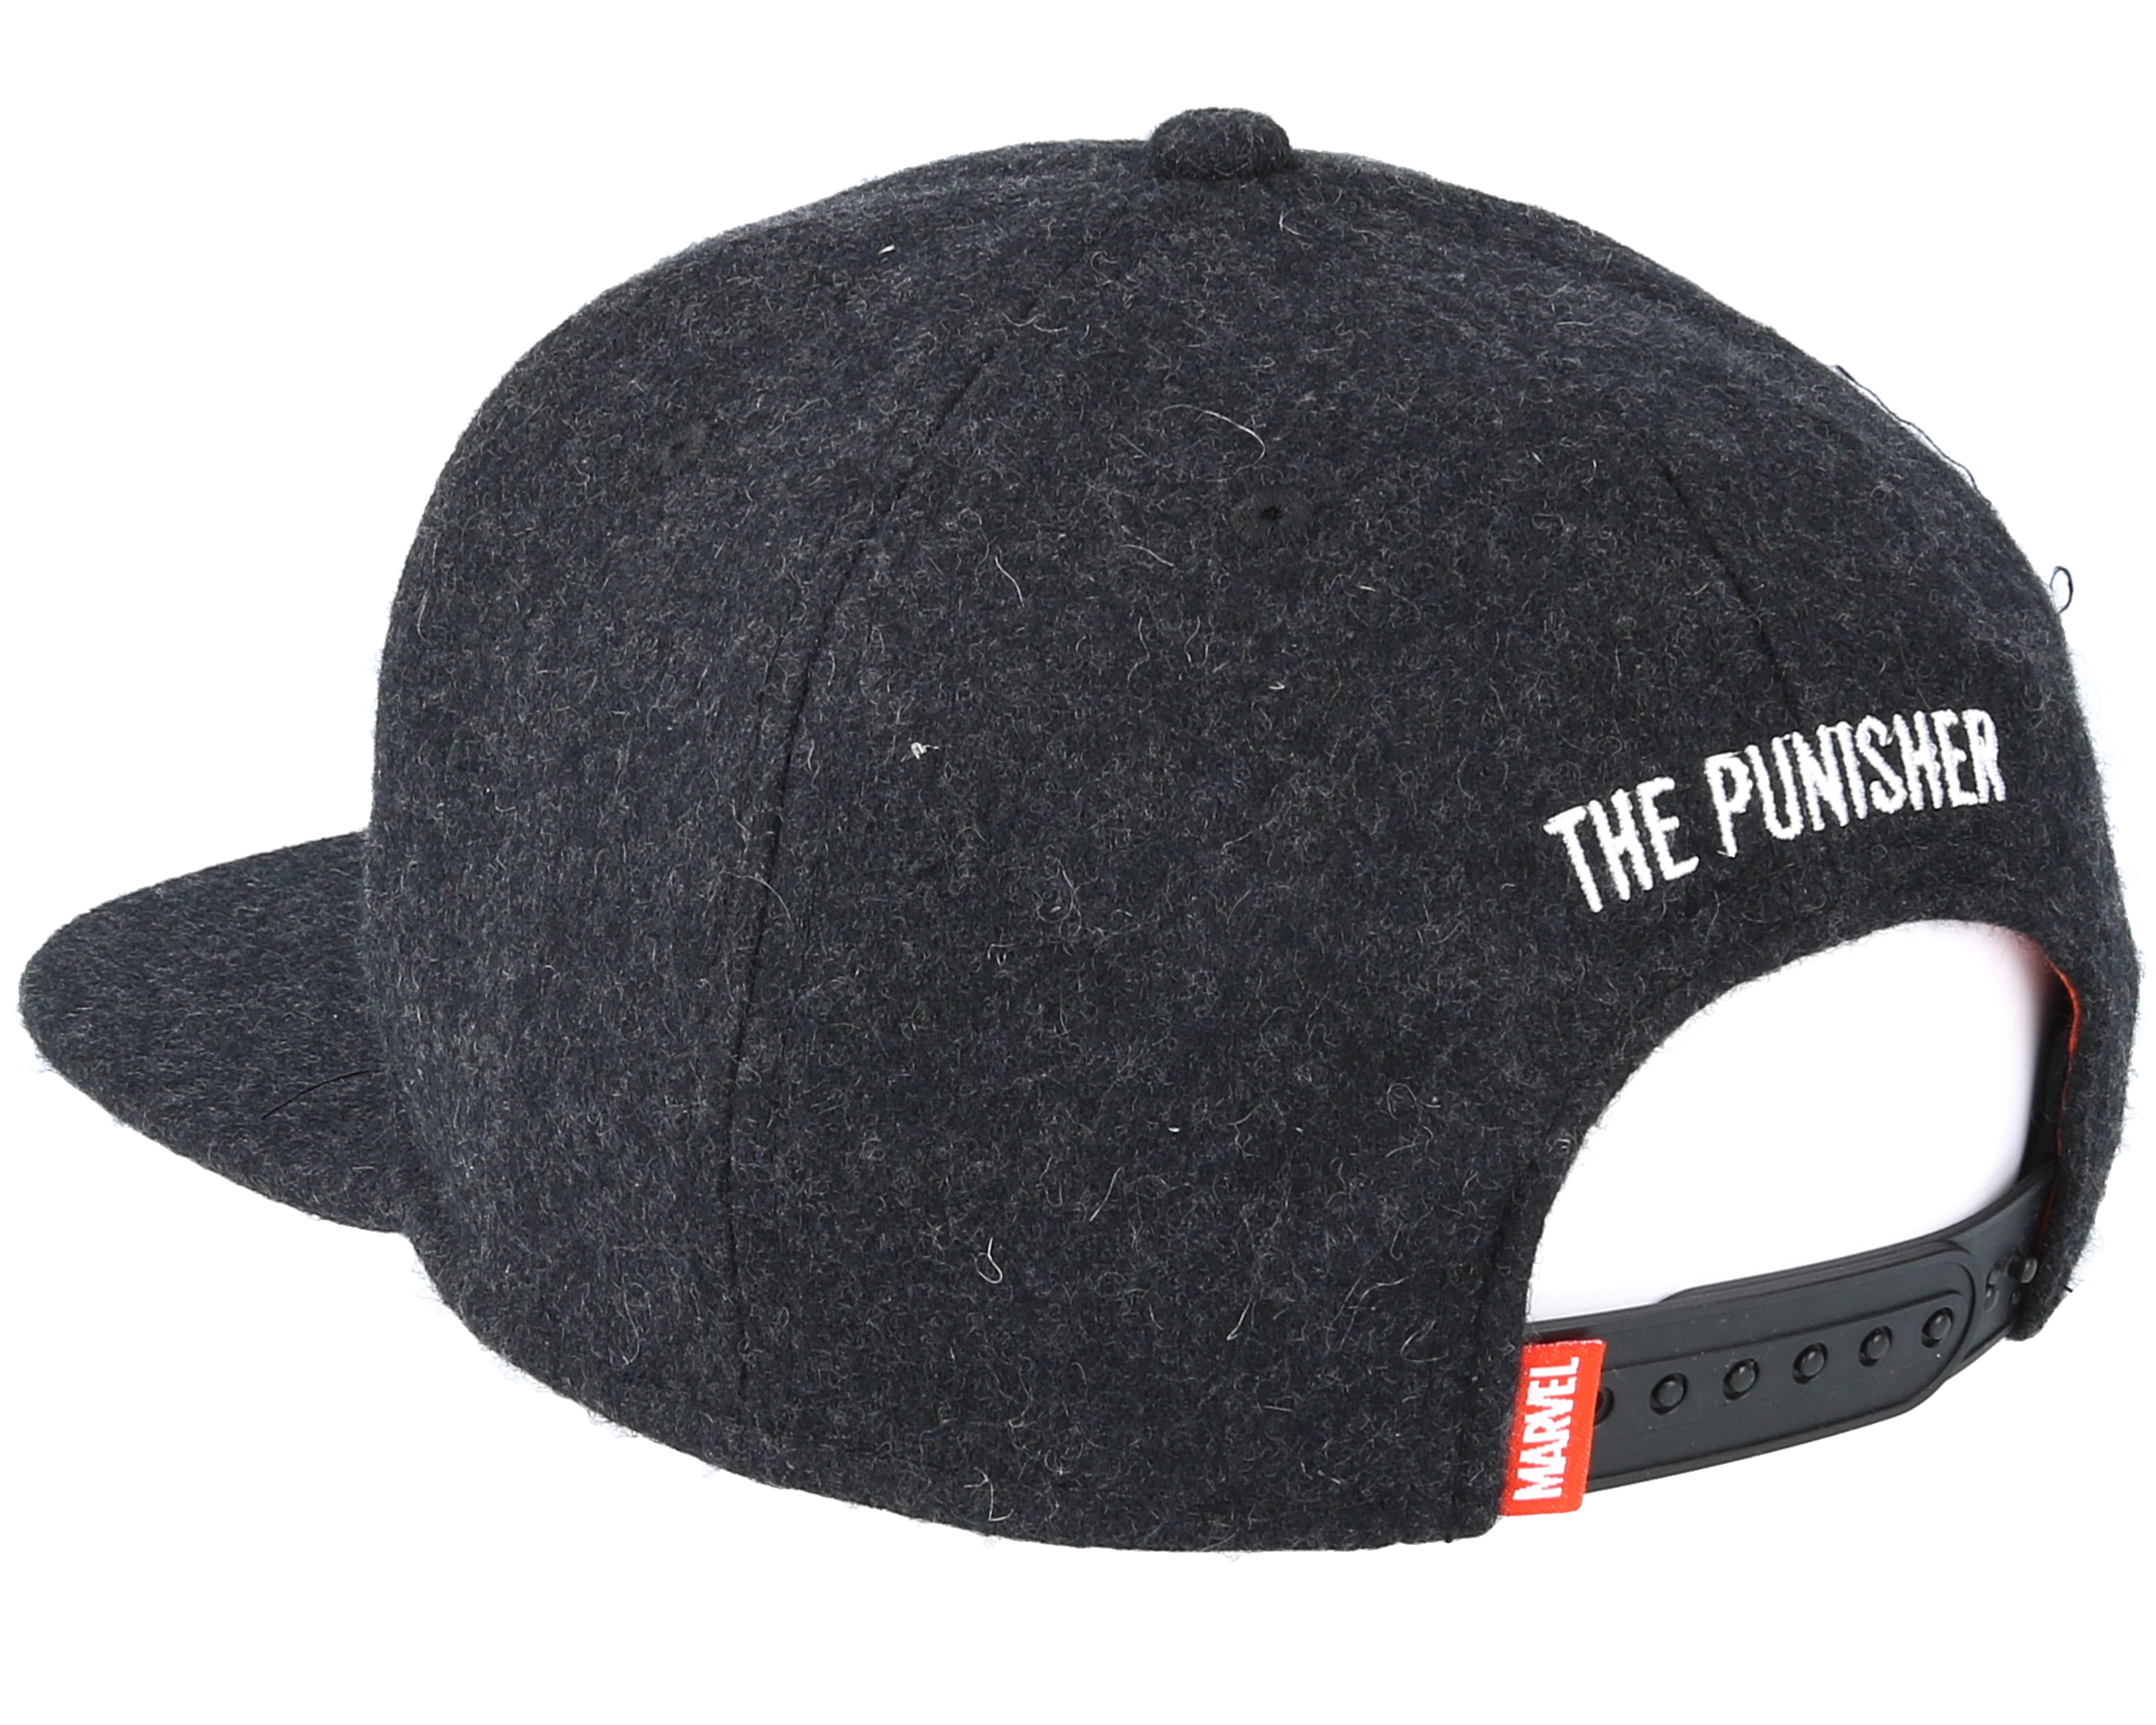 punisher hat in addition - photo #32